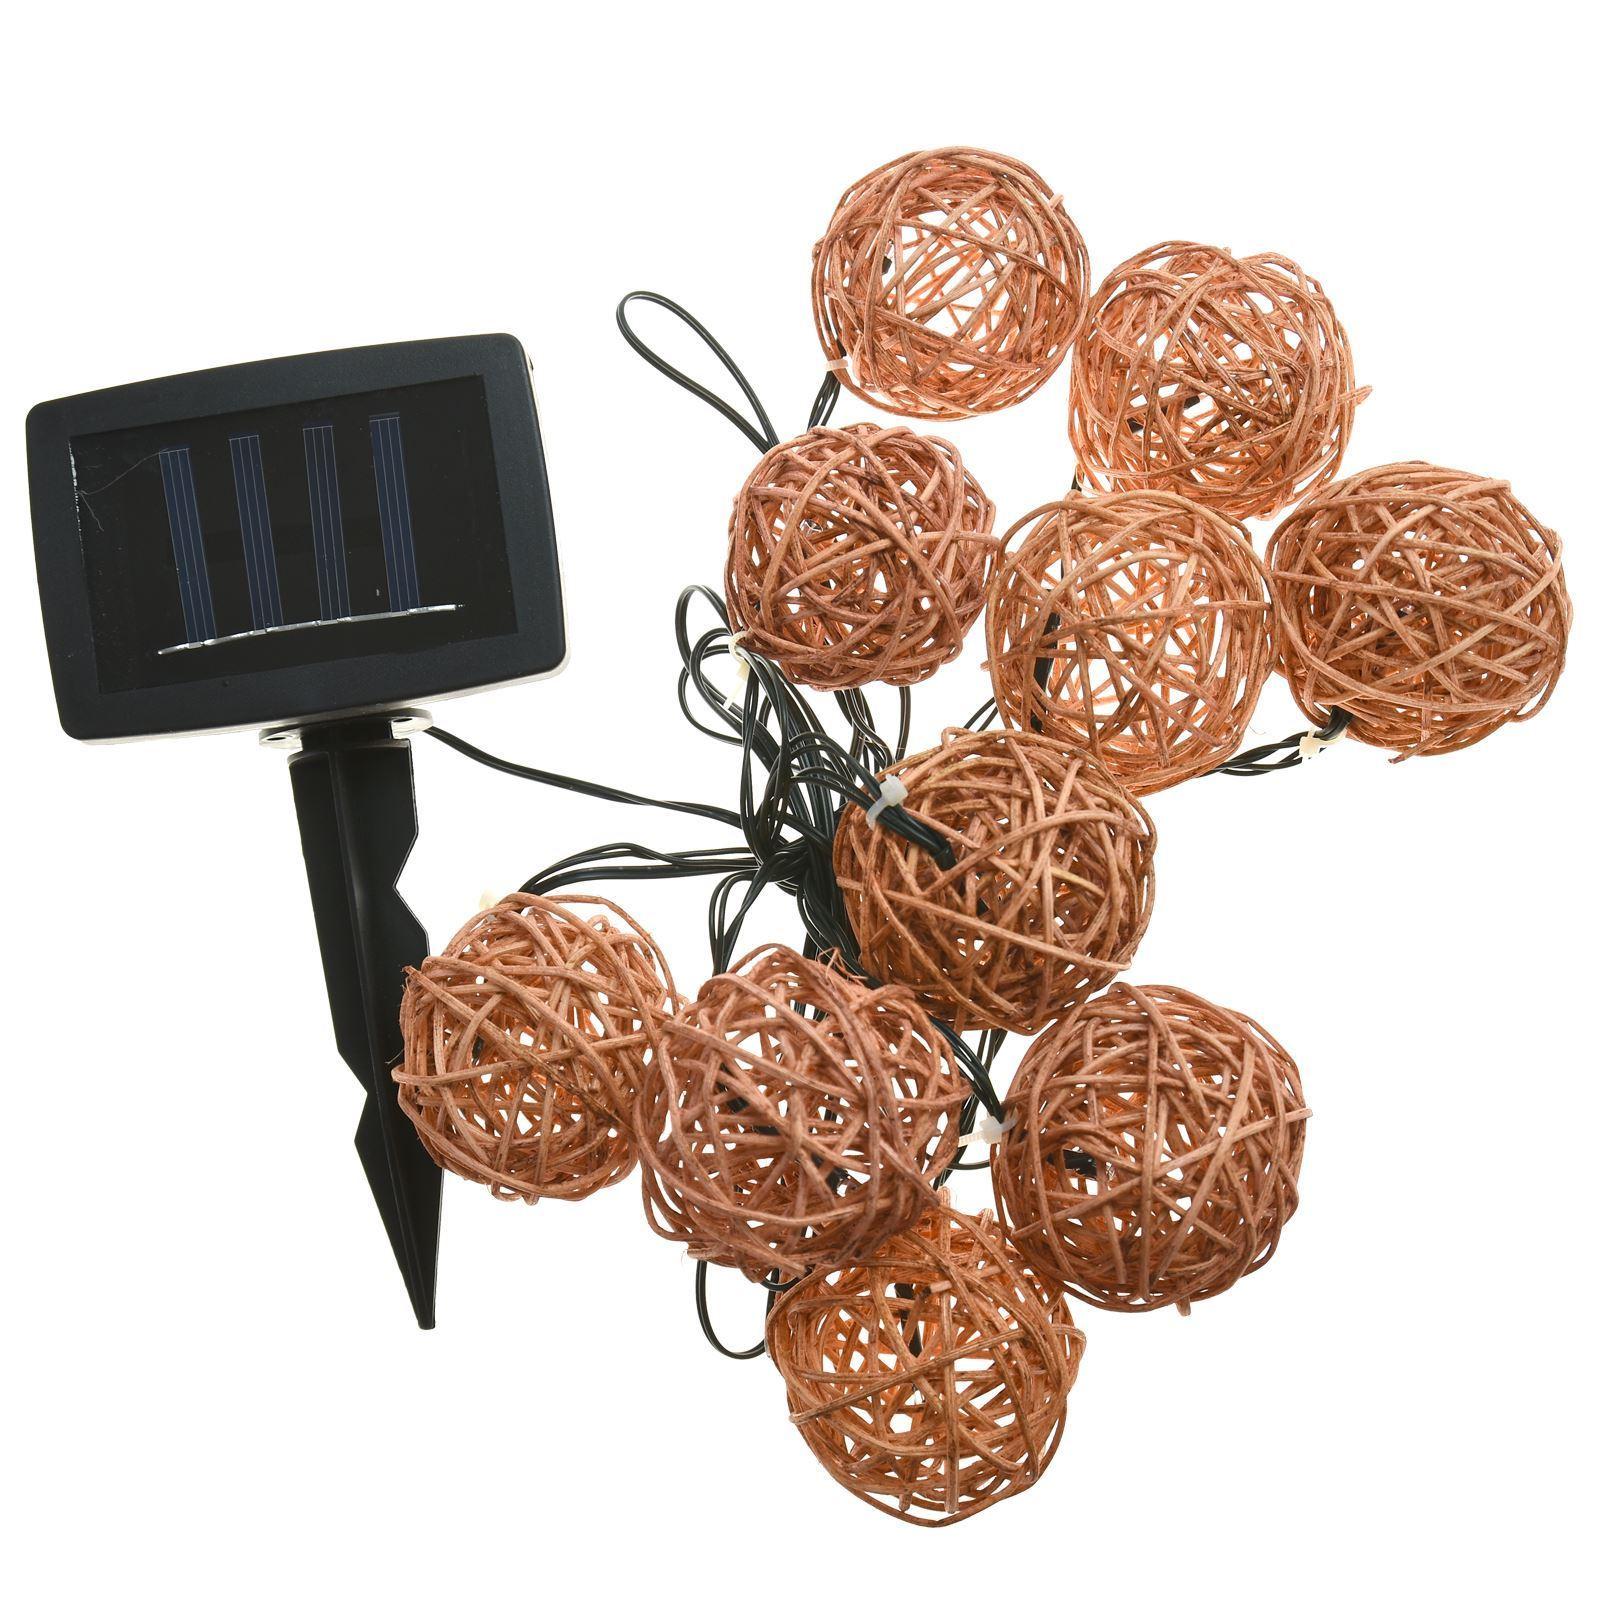 10 Rattan LED String Lights, Solar Powered, Garden Decoration, Auto On/Off eBay